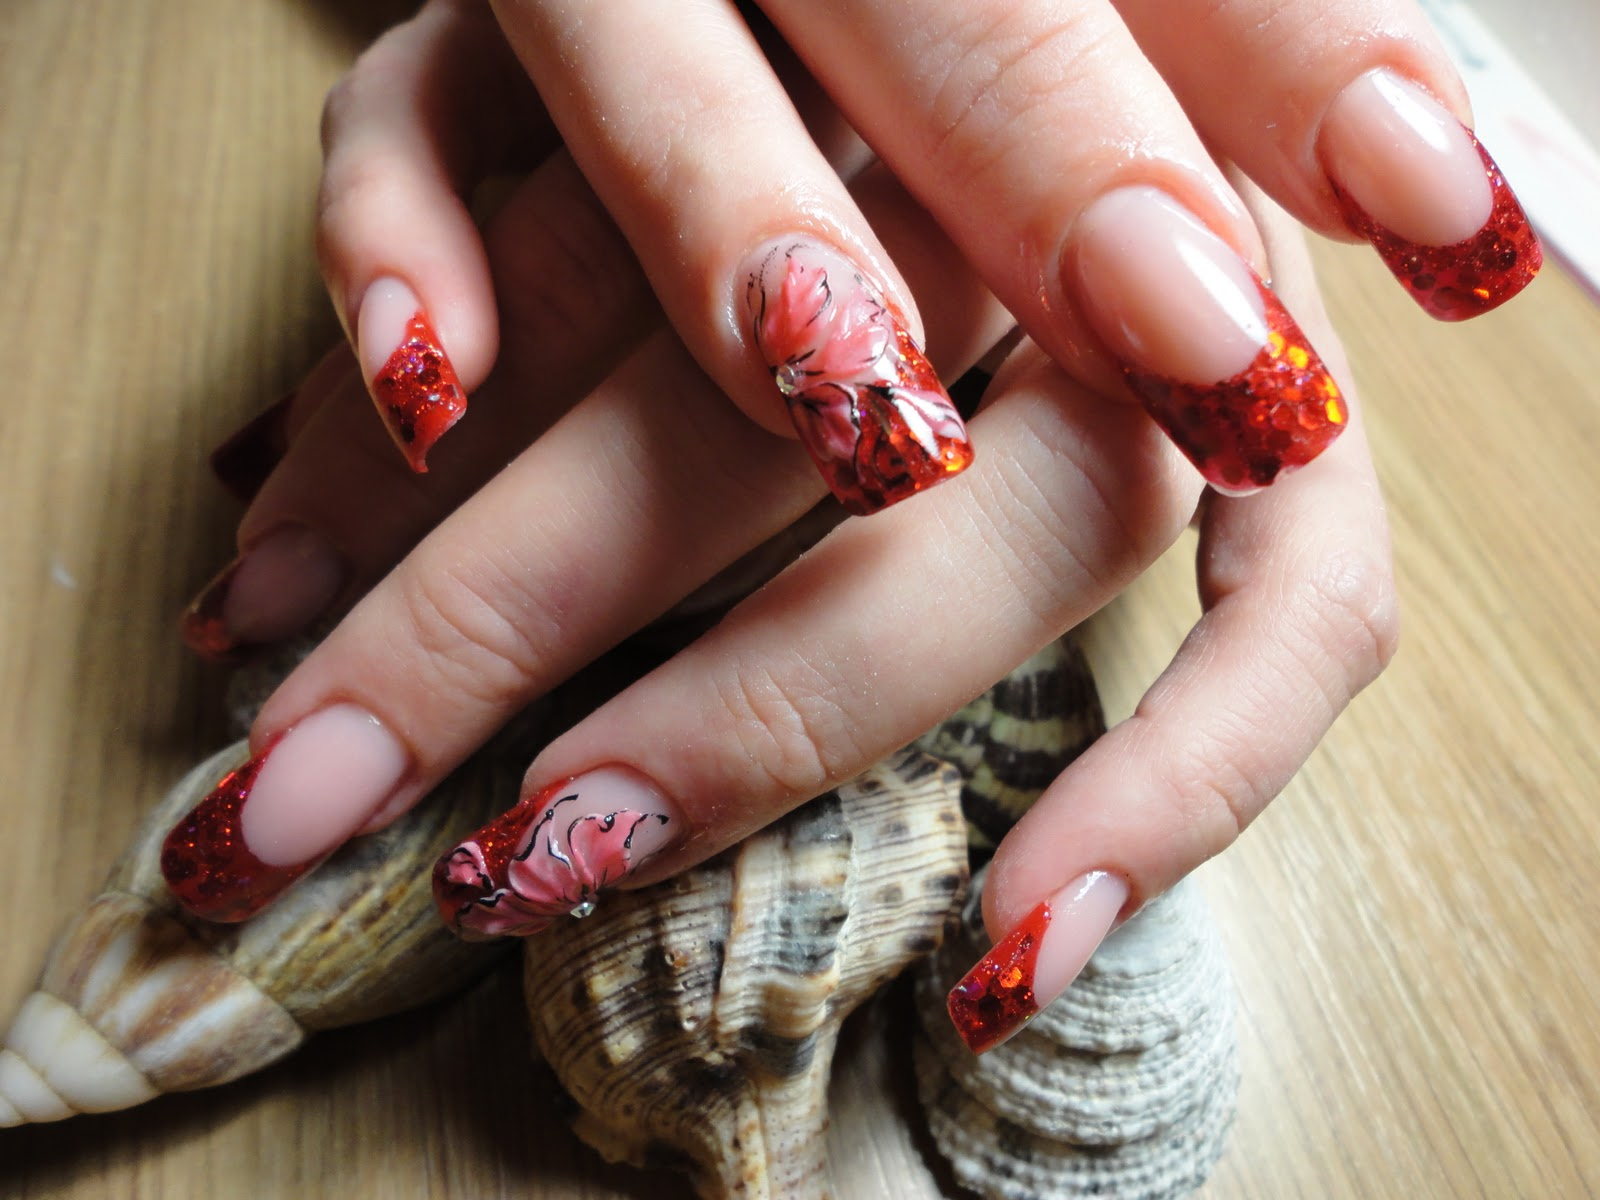 Acrylic Nails: Painted acrylic nails by Natalia